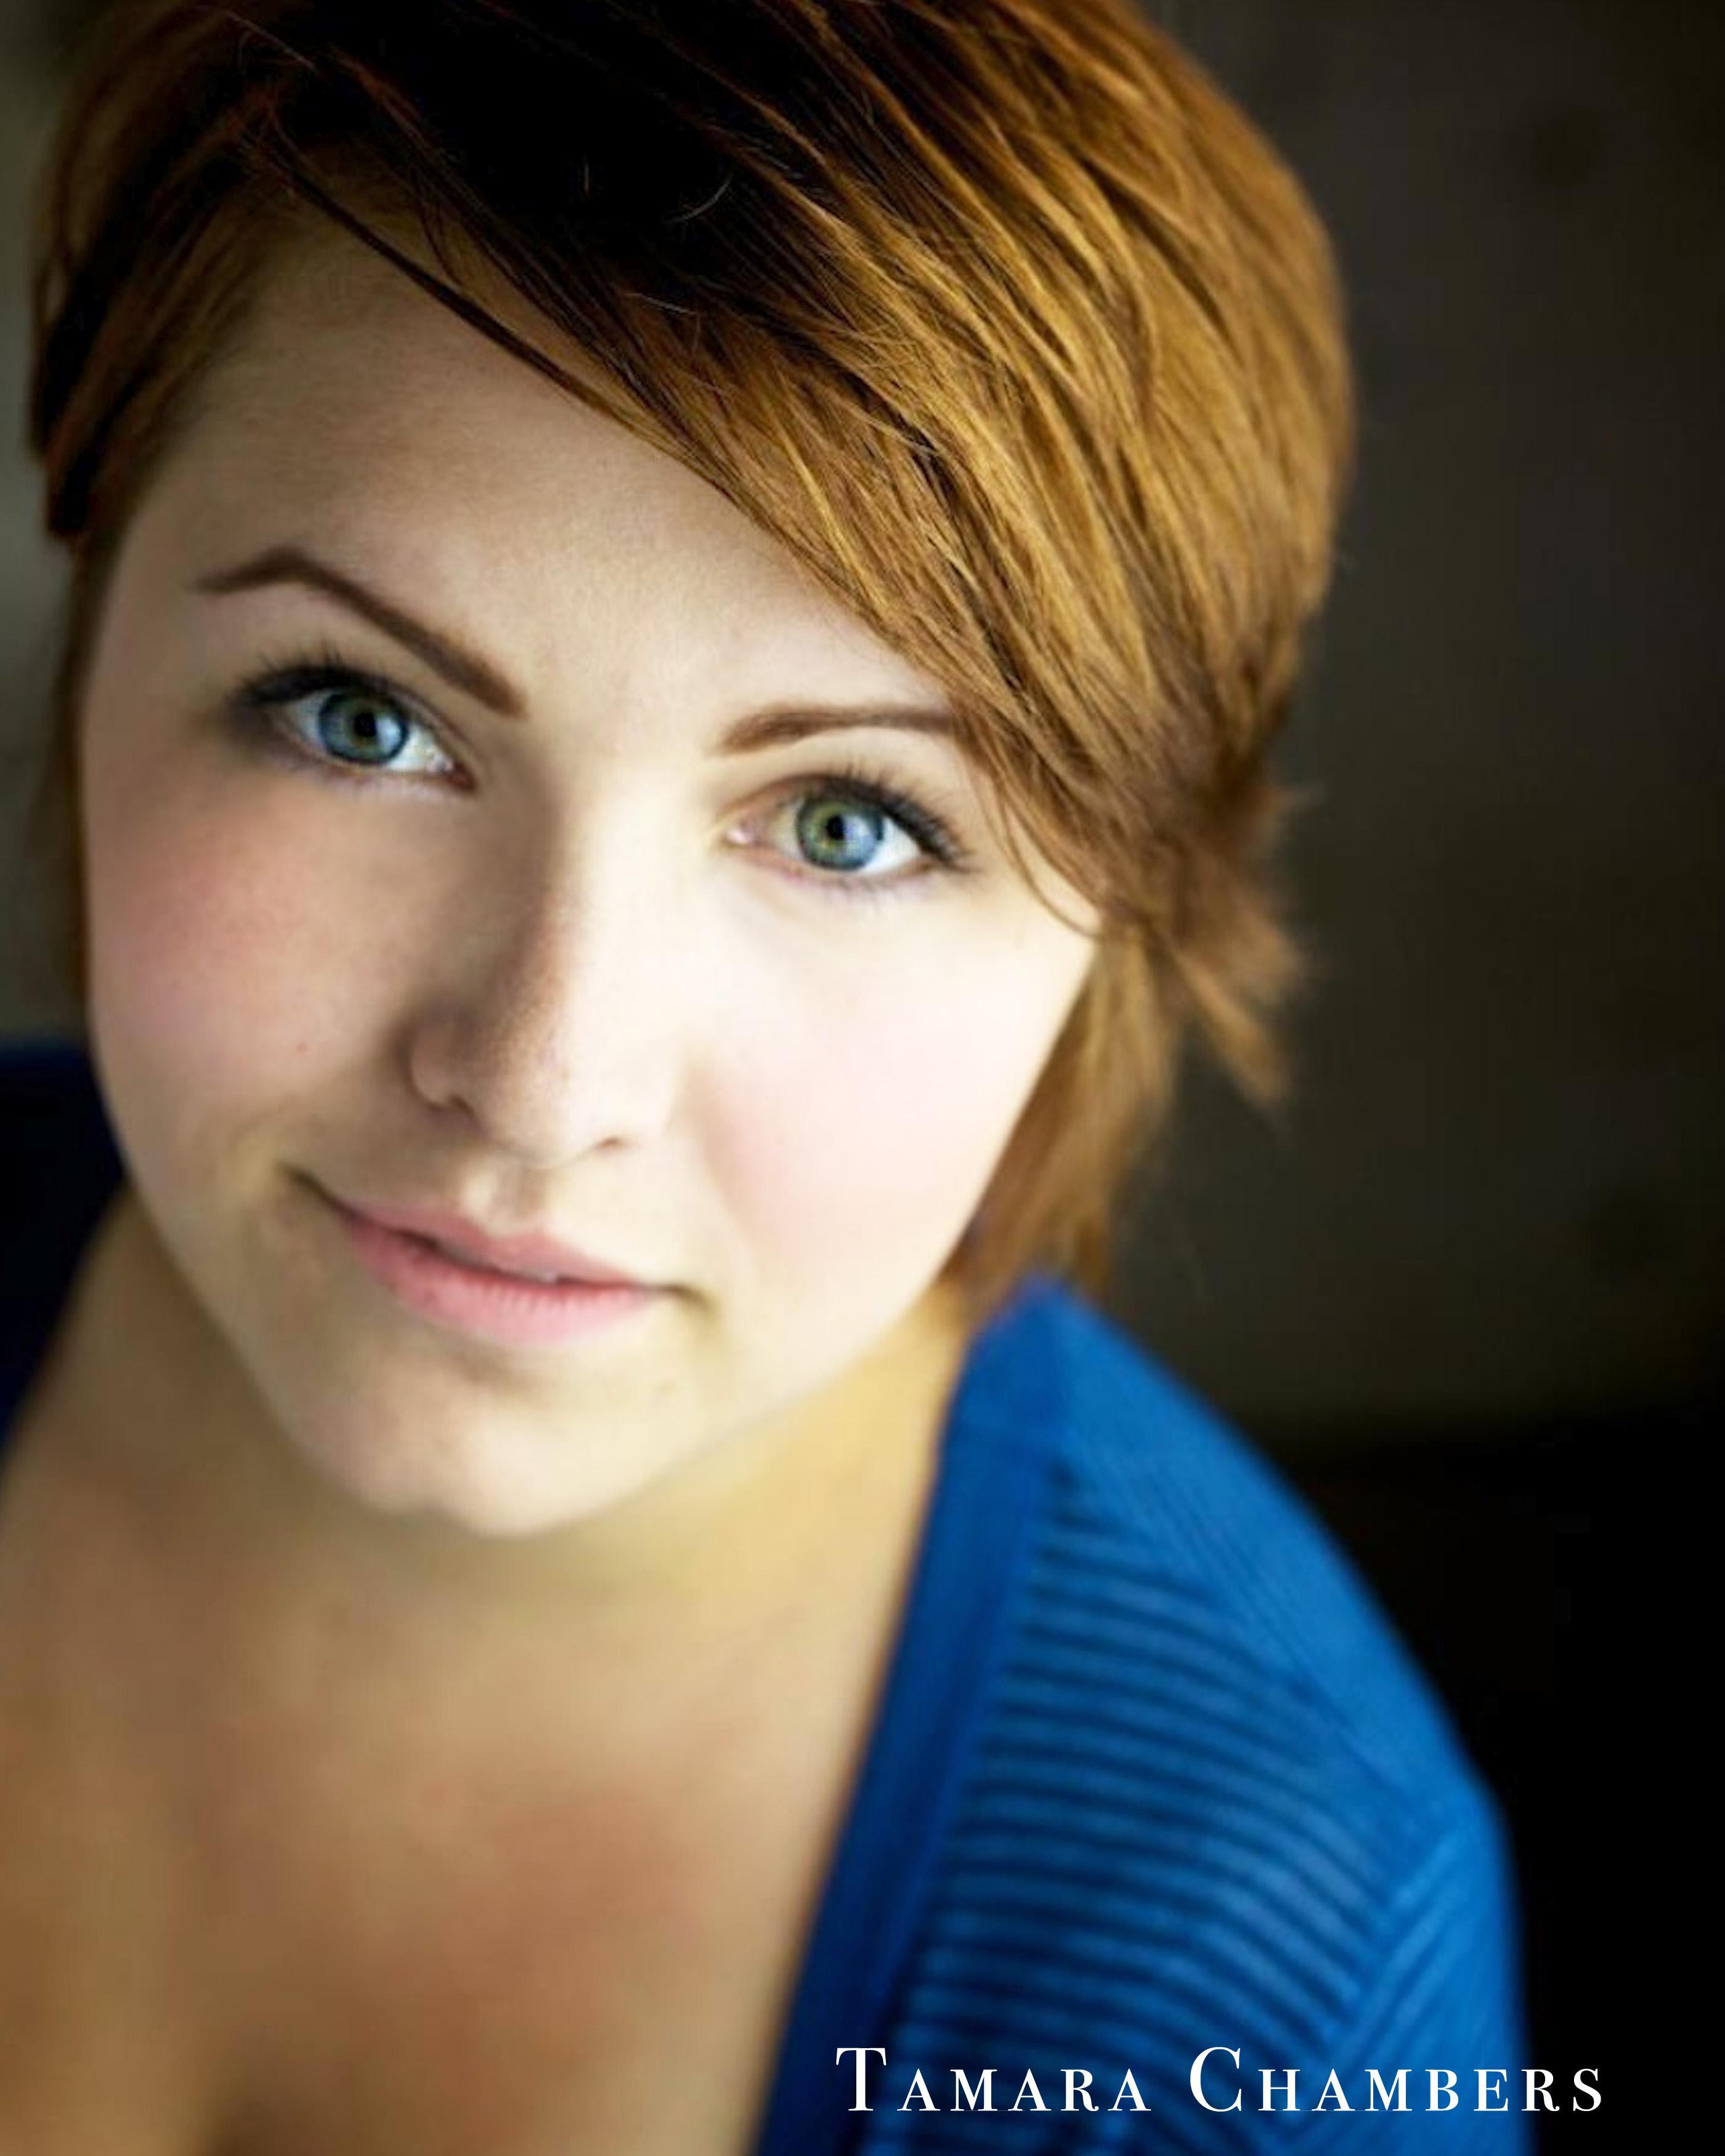 Cute chubby actress